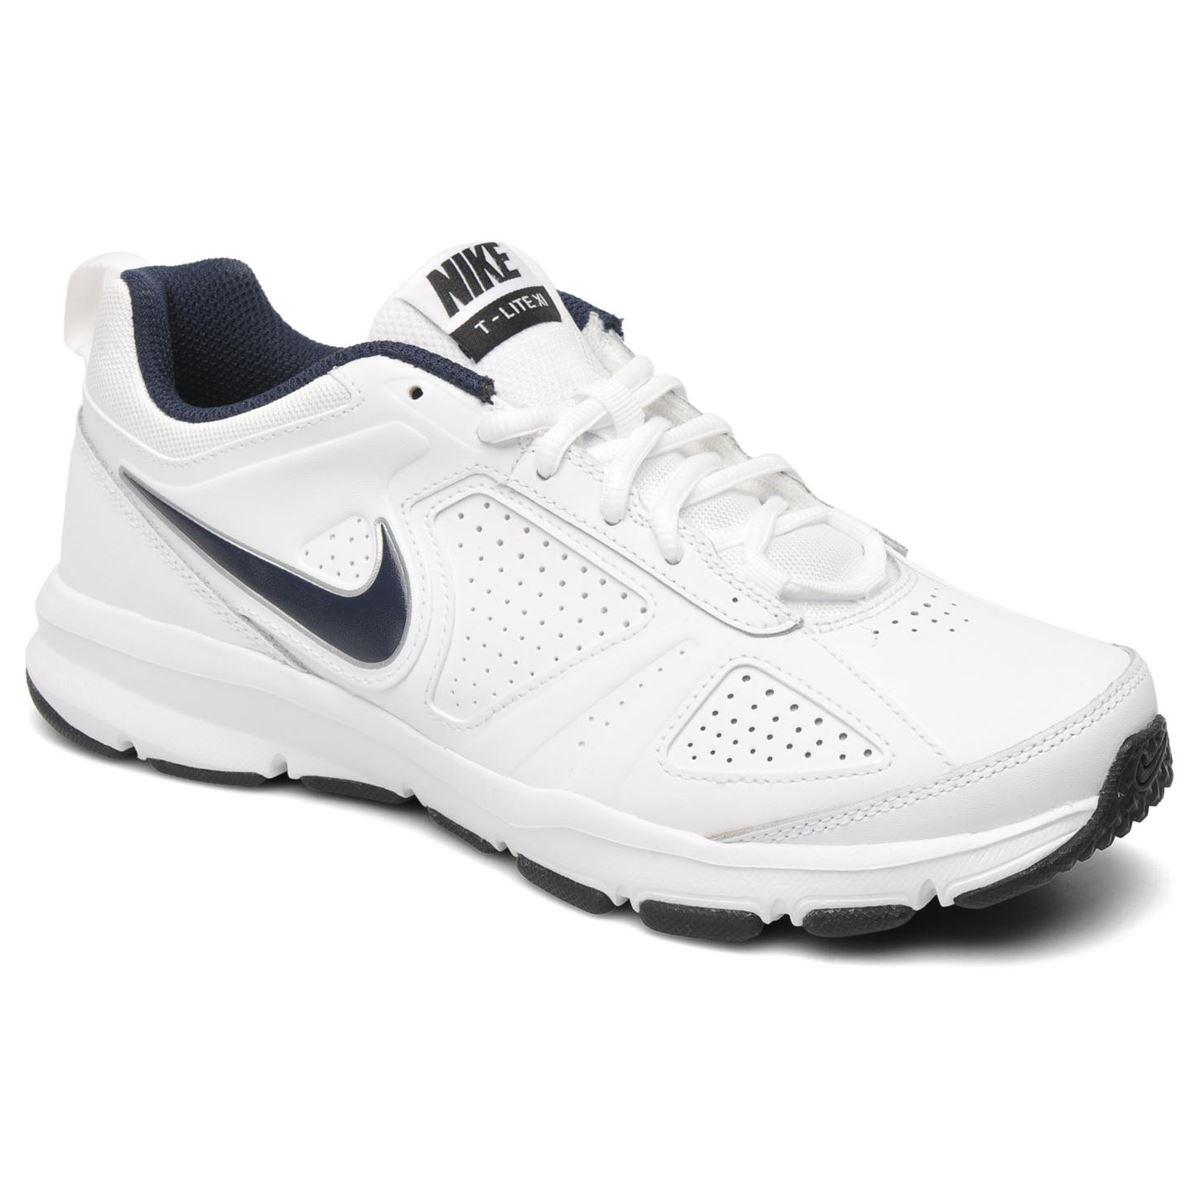 Nike trainers t lite xi women s sneakers sports runing shoes black - Nike T Lite Xi White Black Mens Trainers 616544 101